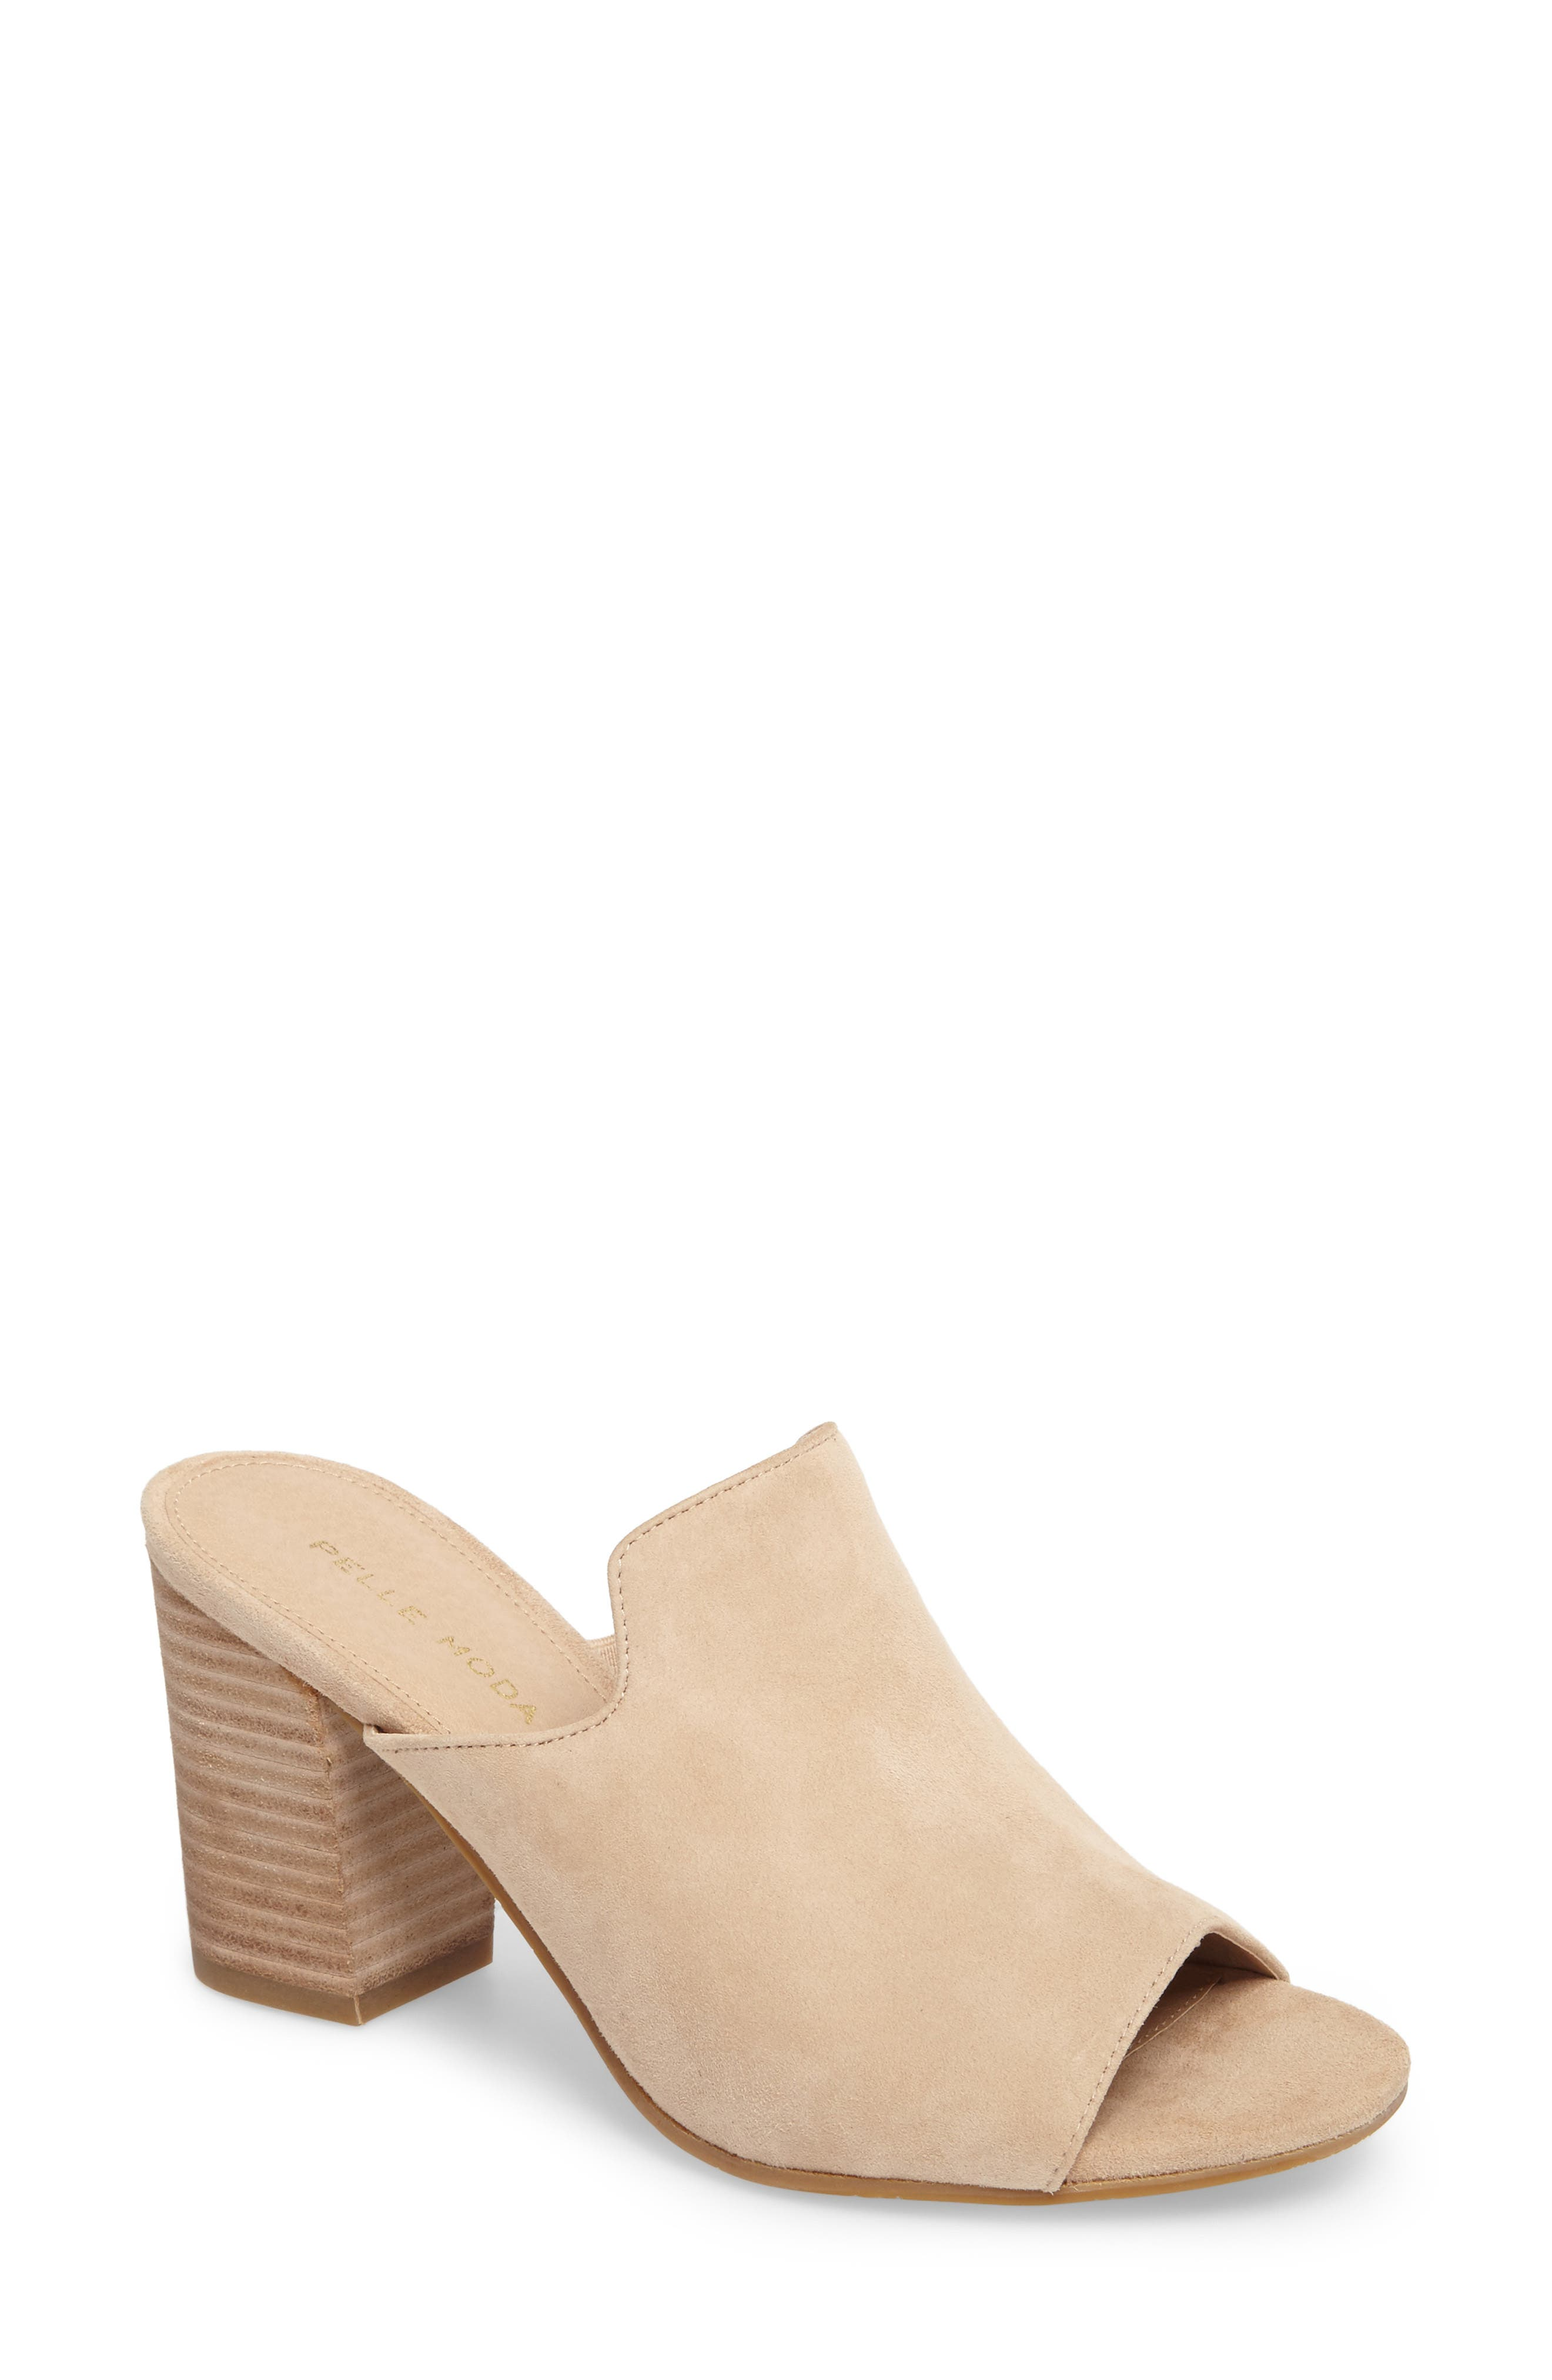 Blair Peep Toe Mule,                             Main thumbnail 1, color,                             Sand Leather